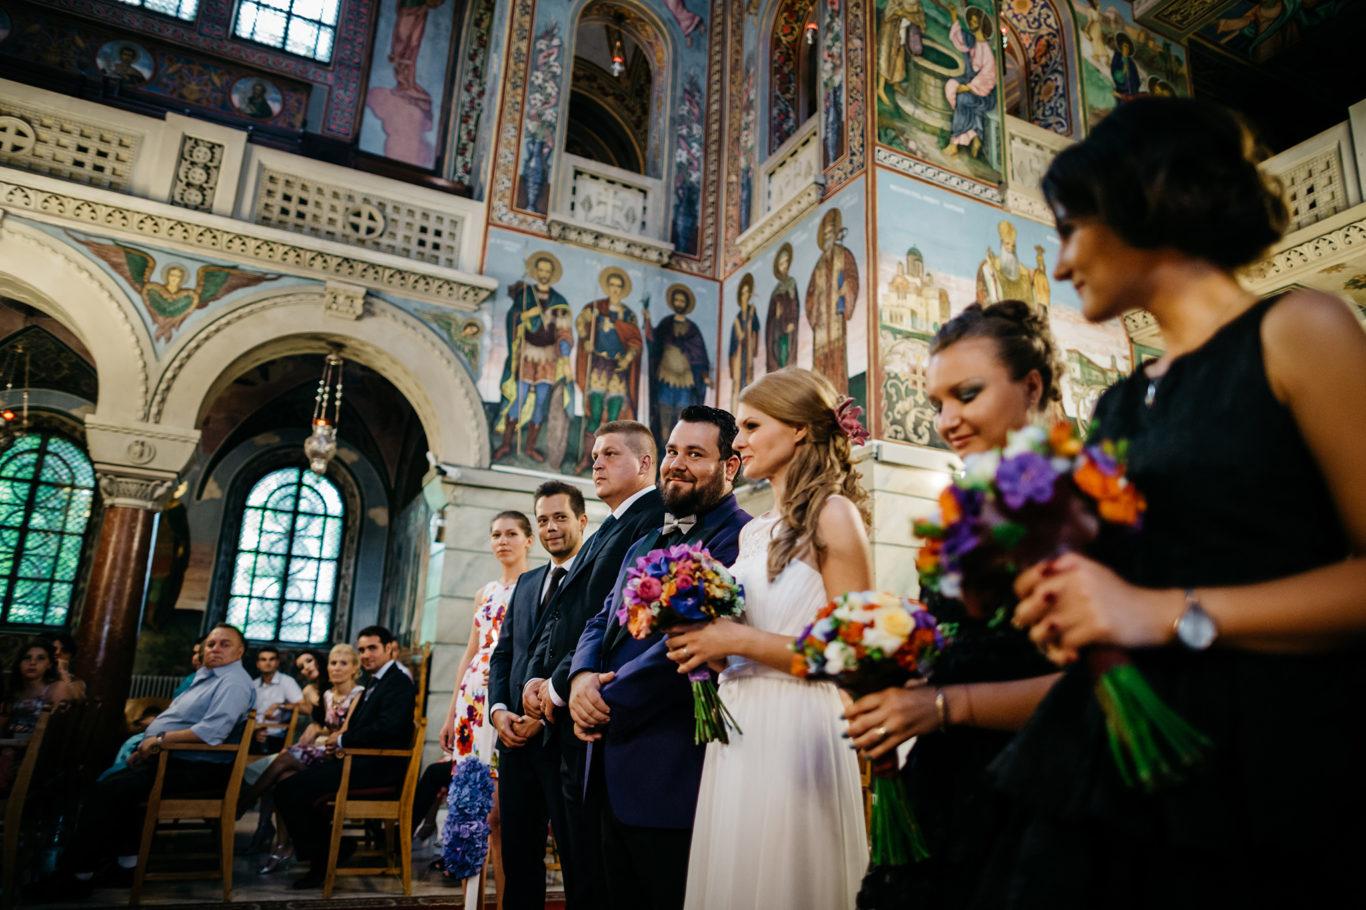 0347-fotografie-nunta-bucuresti-rodica-rares-fotograf-ciprian-dumitrescu-dc1_0297